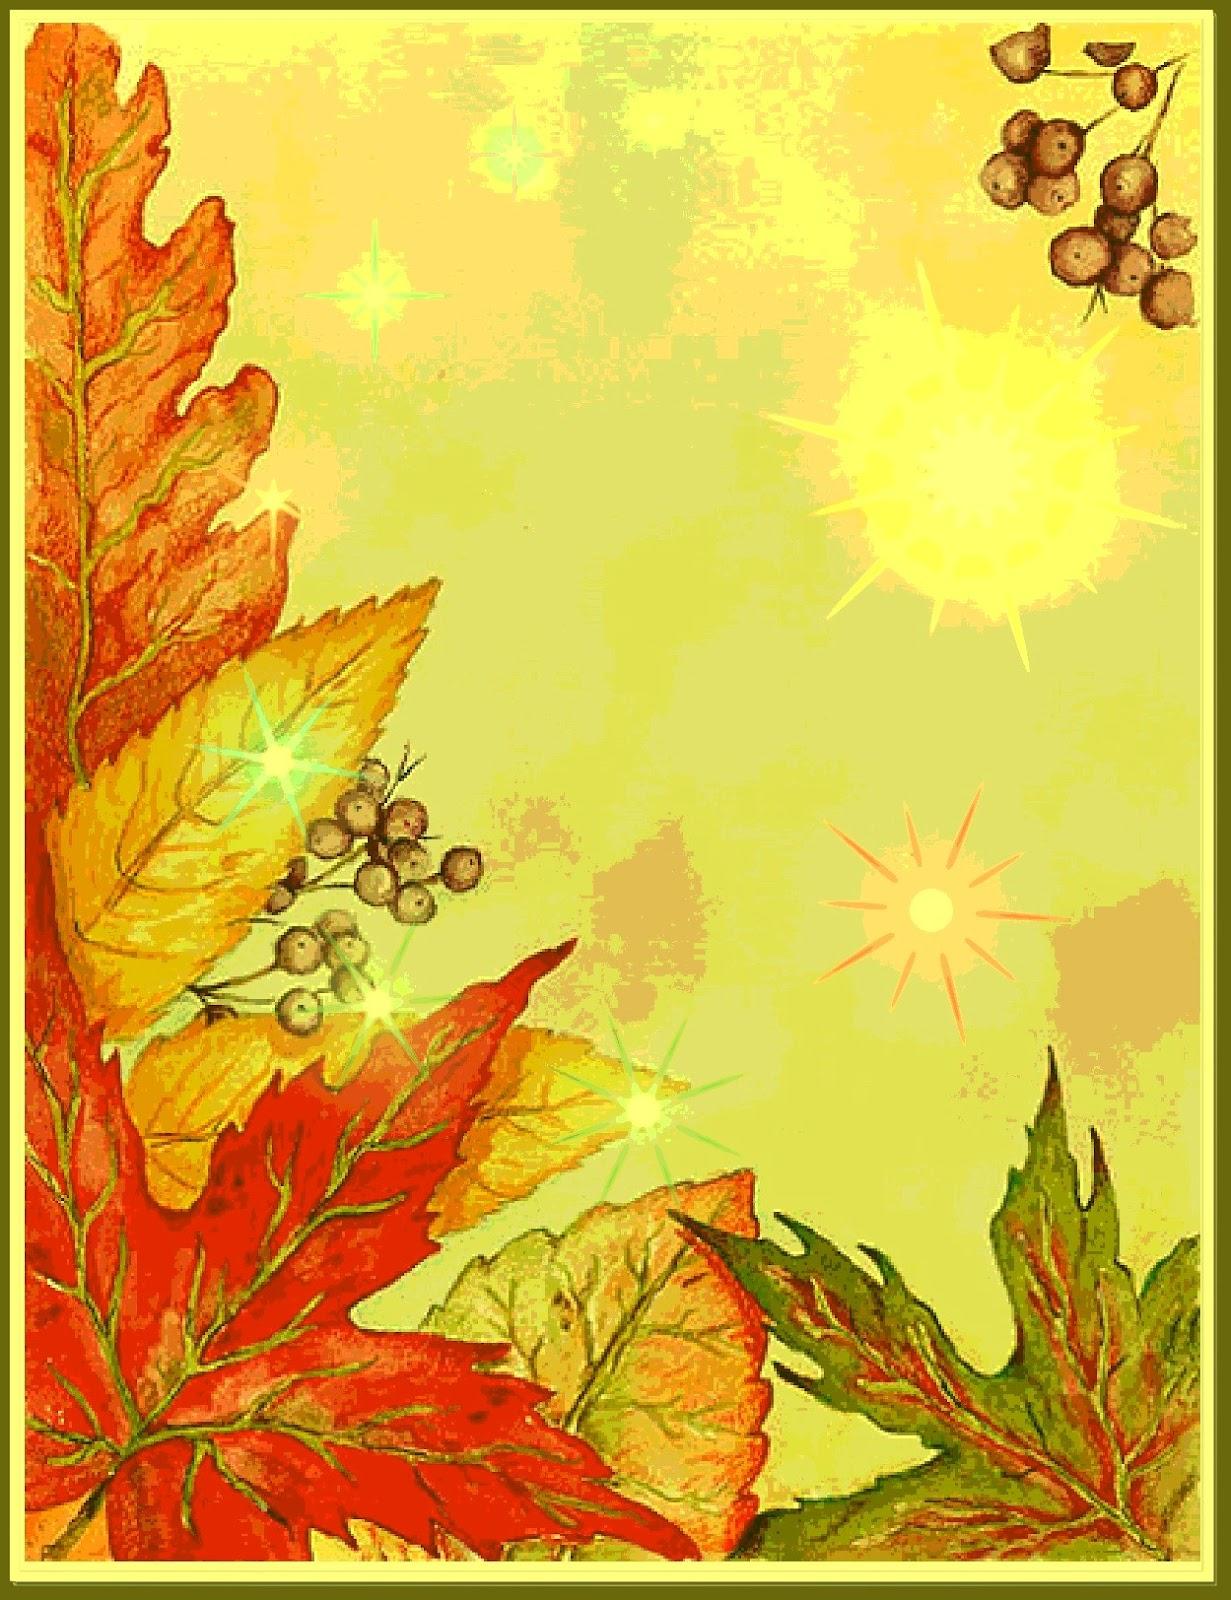 christian fall wallpaper - photo #11